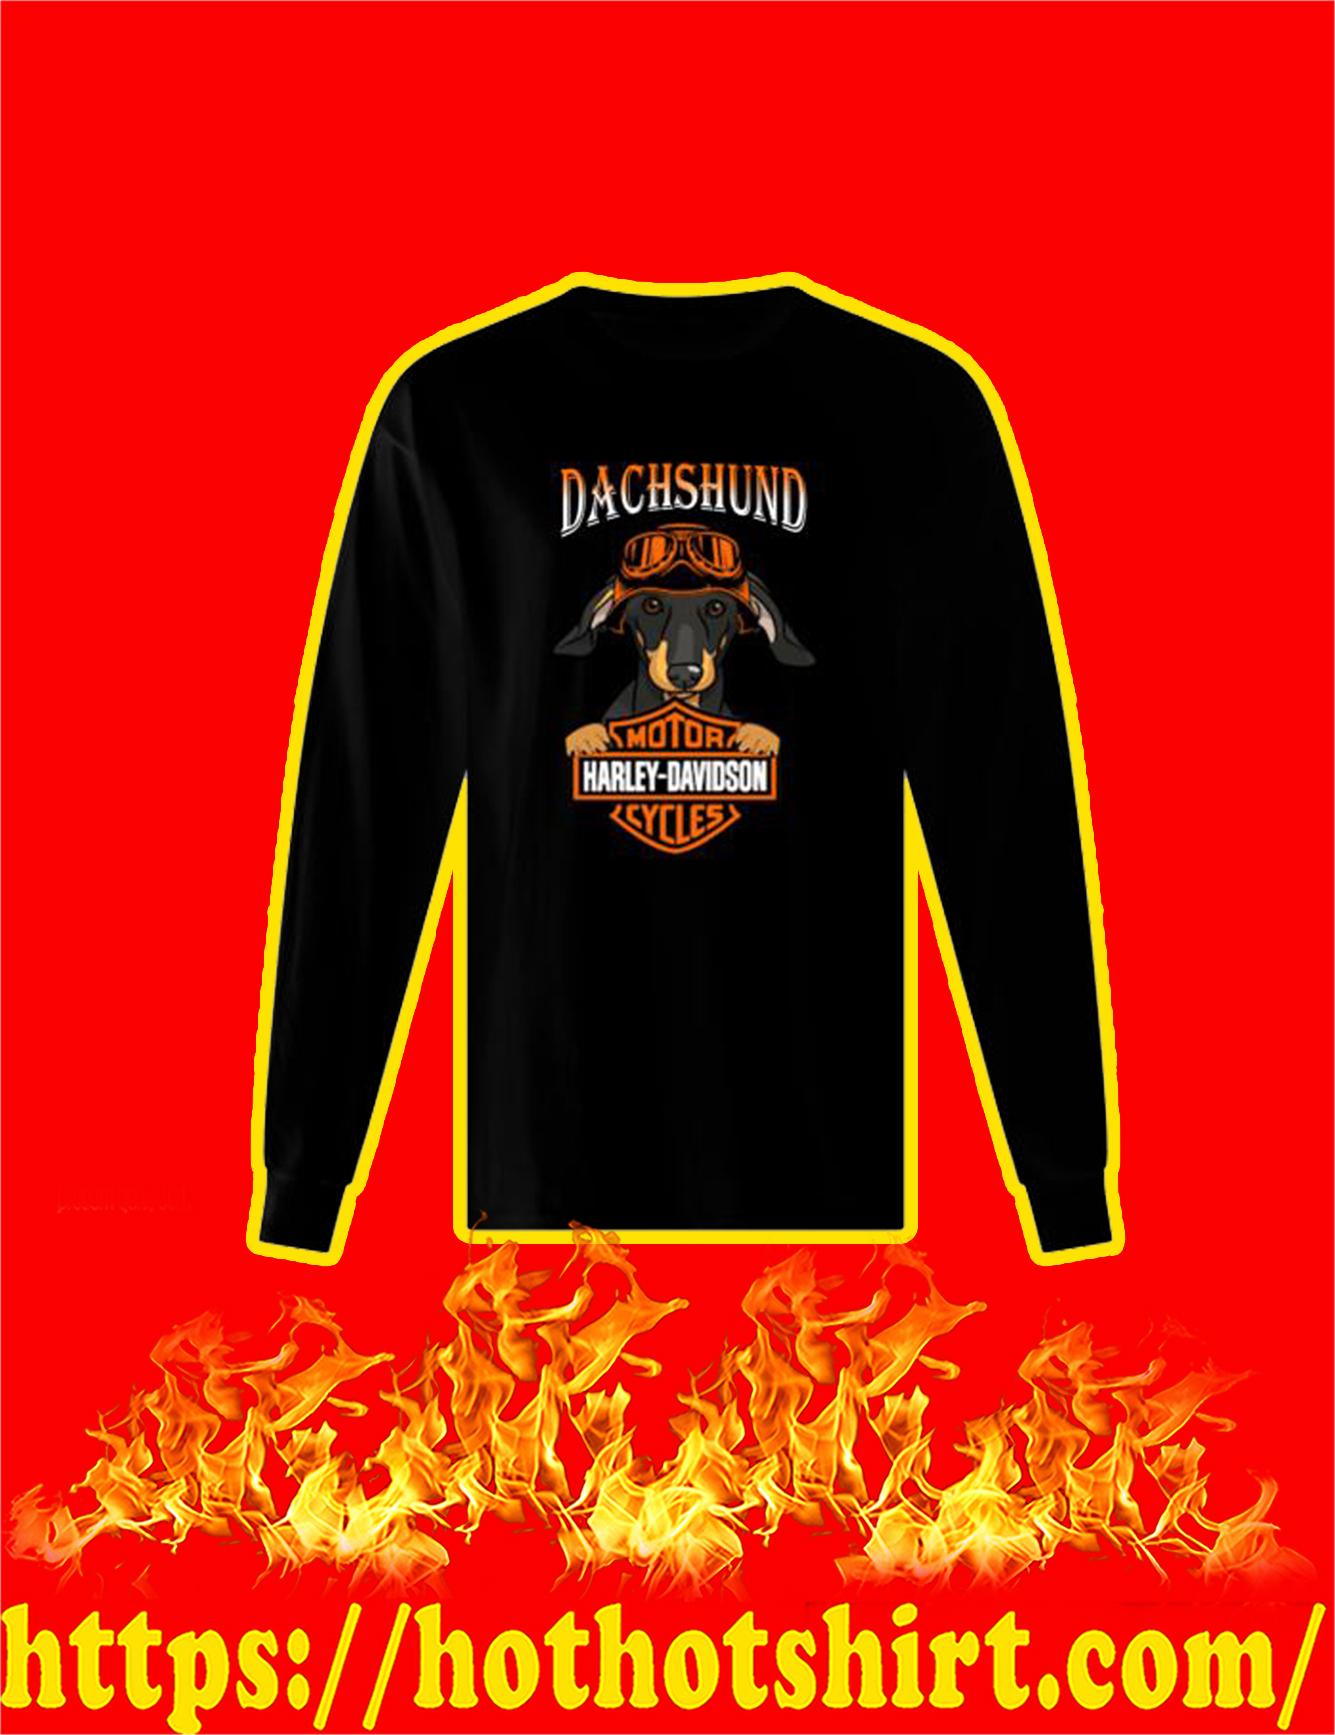 Dachshund Harley Davidson Motorcycles Long Sleeved Shirt